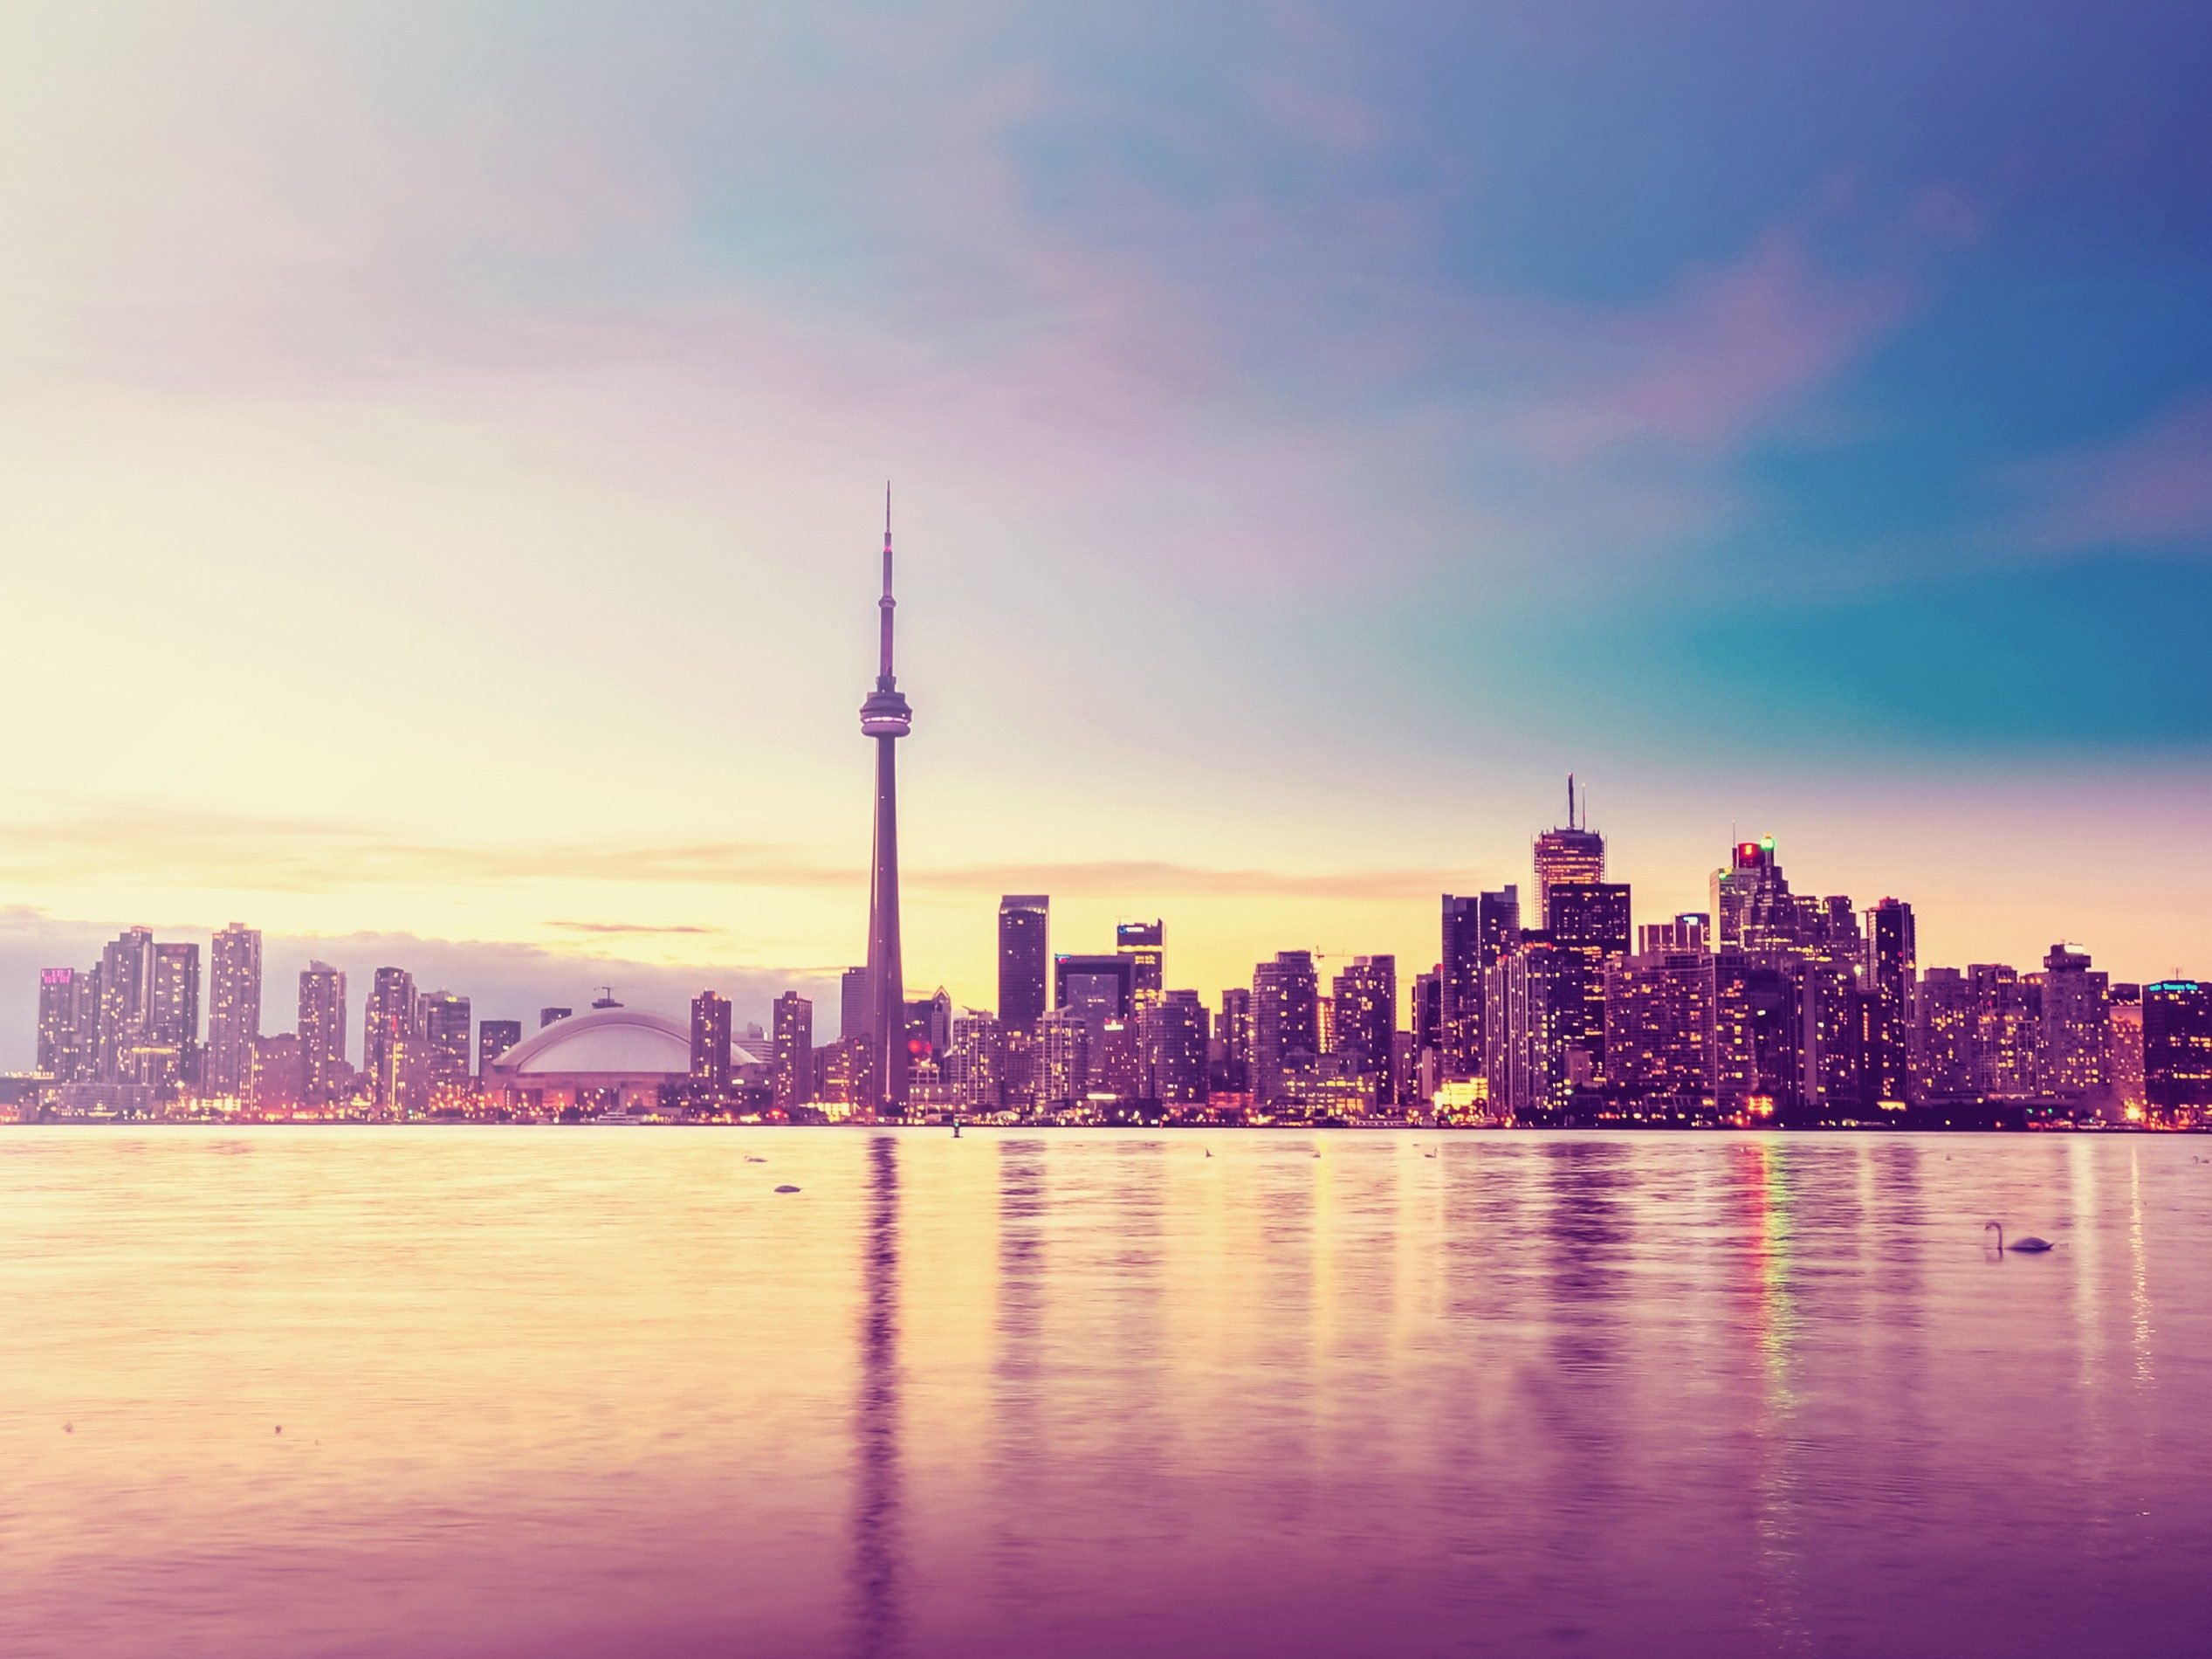 1. The Toronto skyline